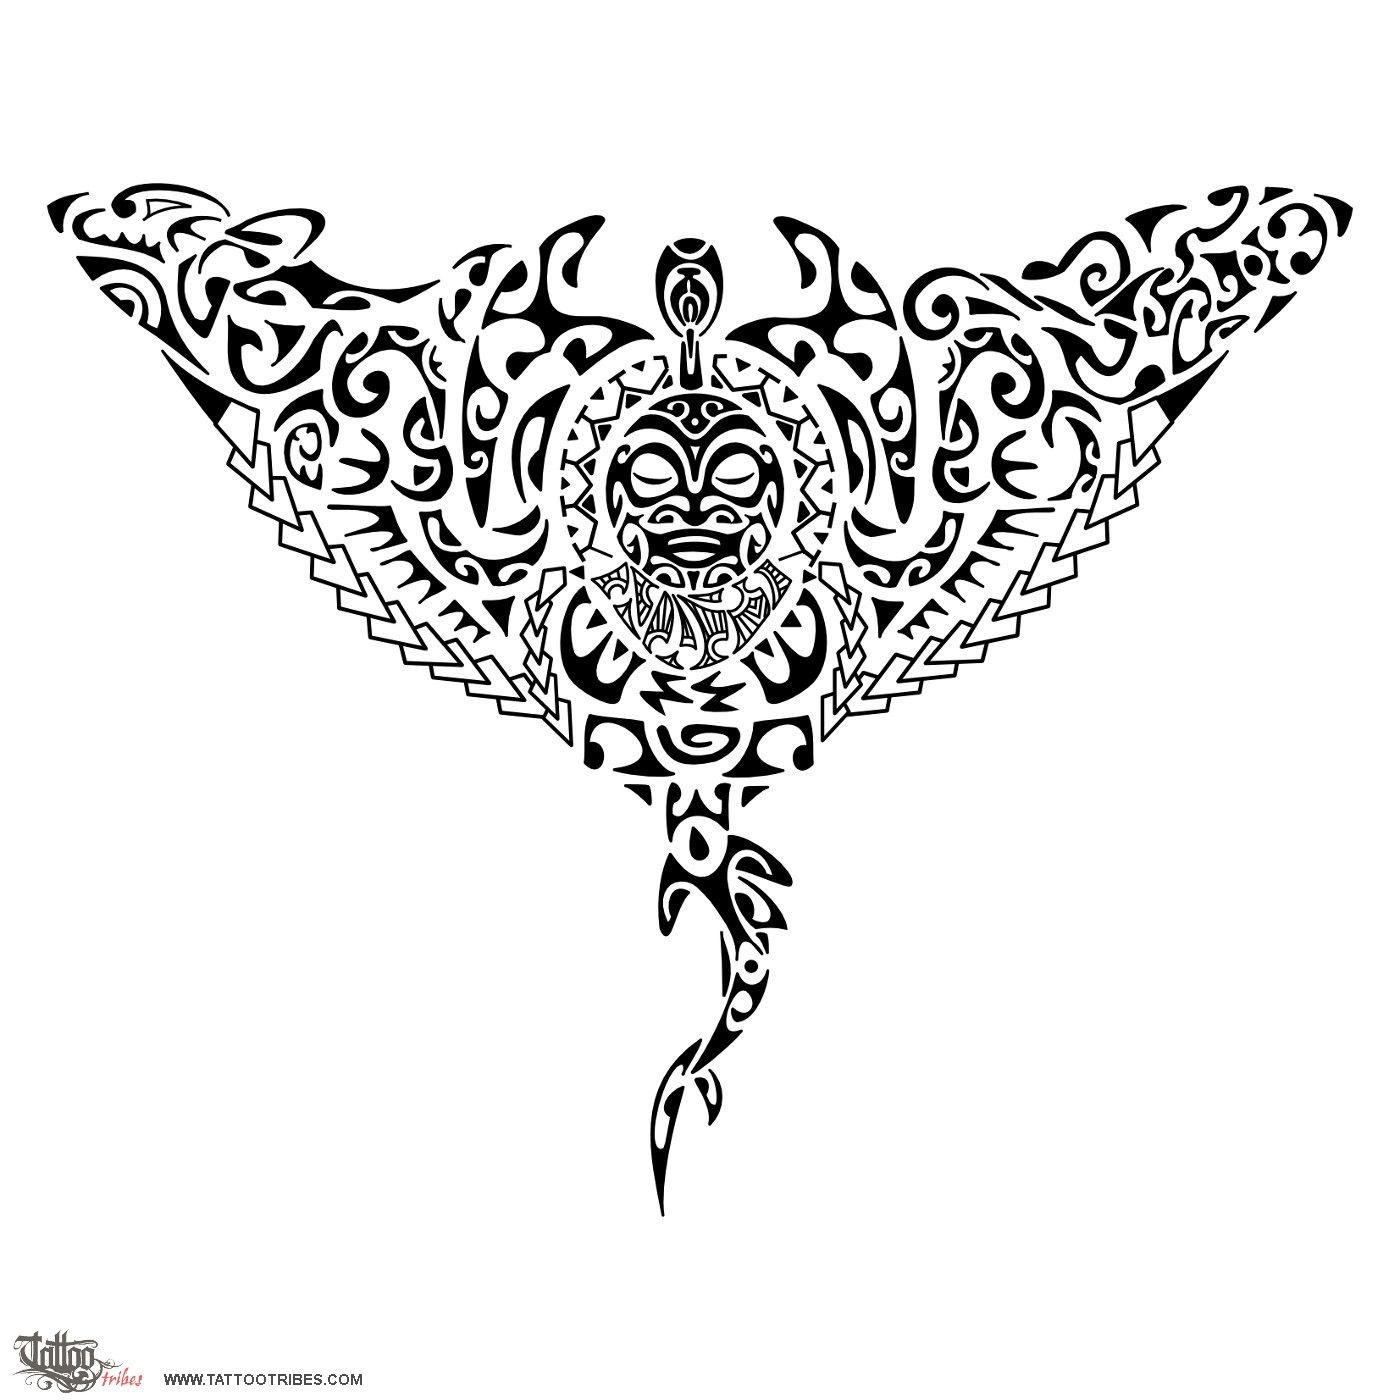 Maori Tattoo Design Wallpaper Wp300369: Maori Manta Ray Tattoo - Buscar Con Google